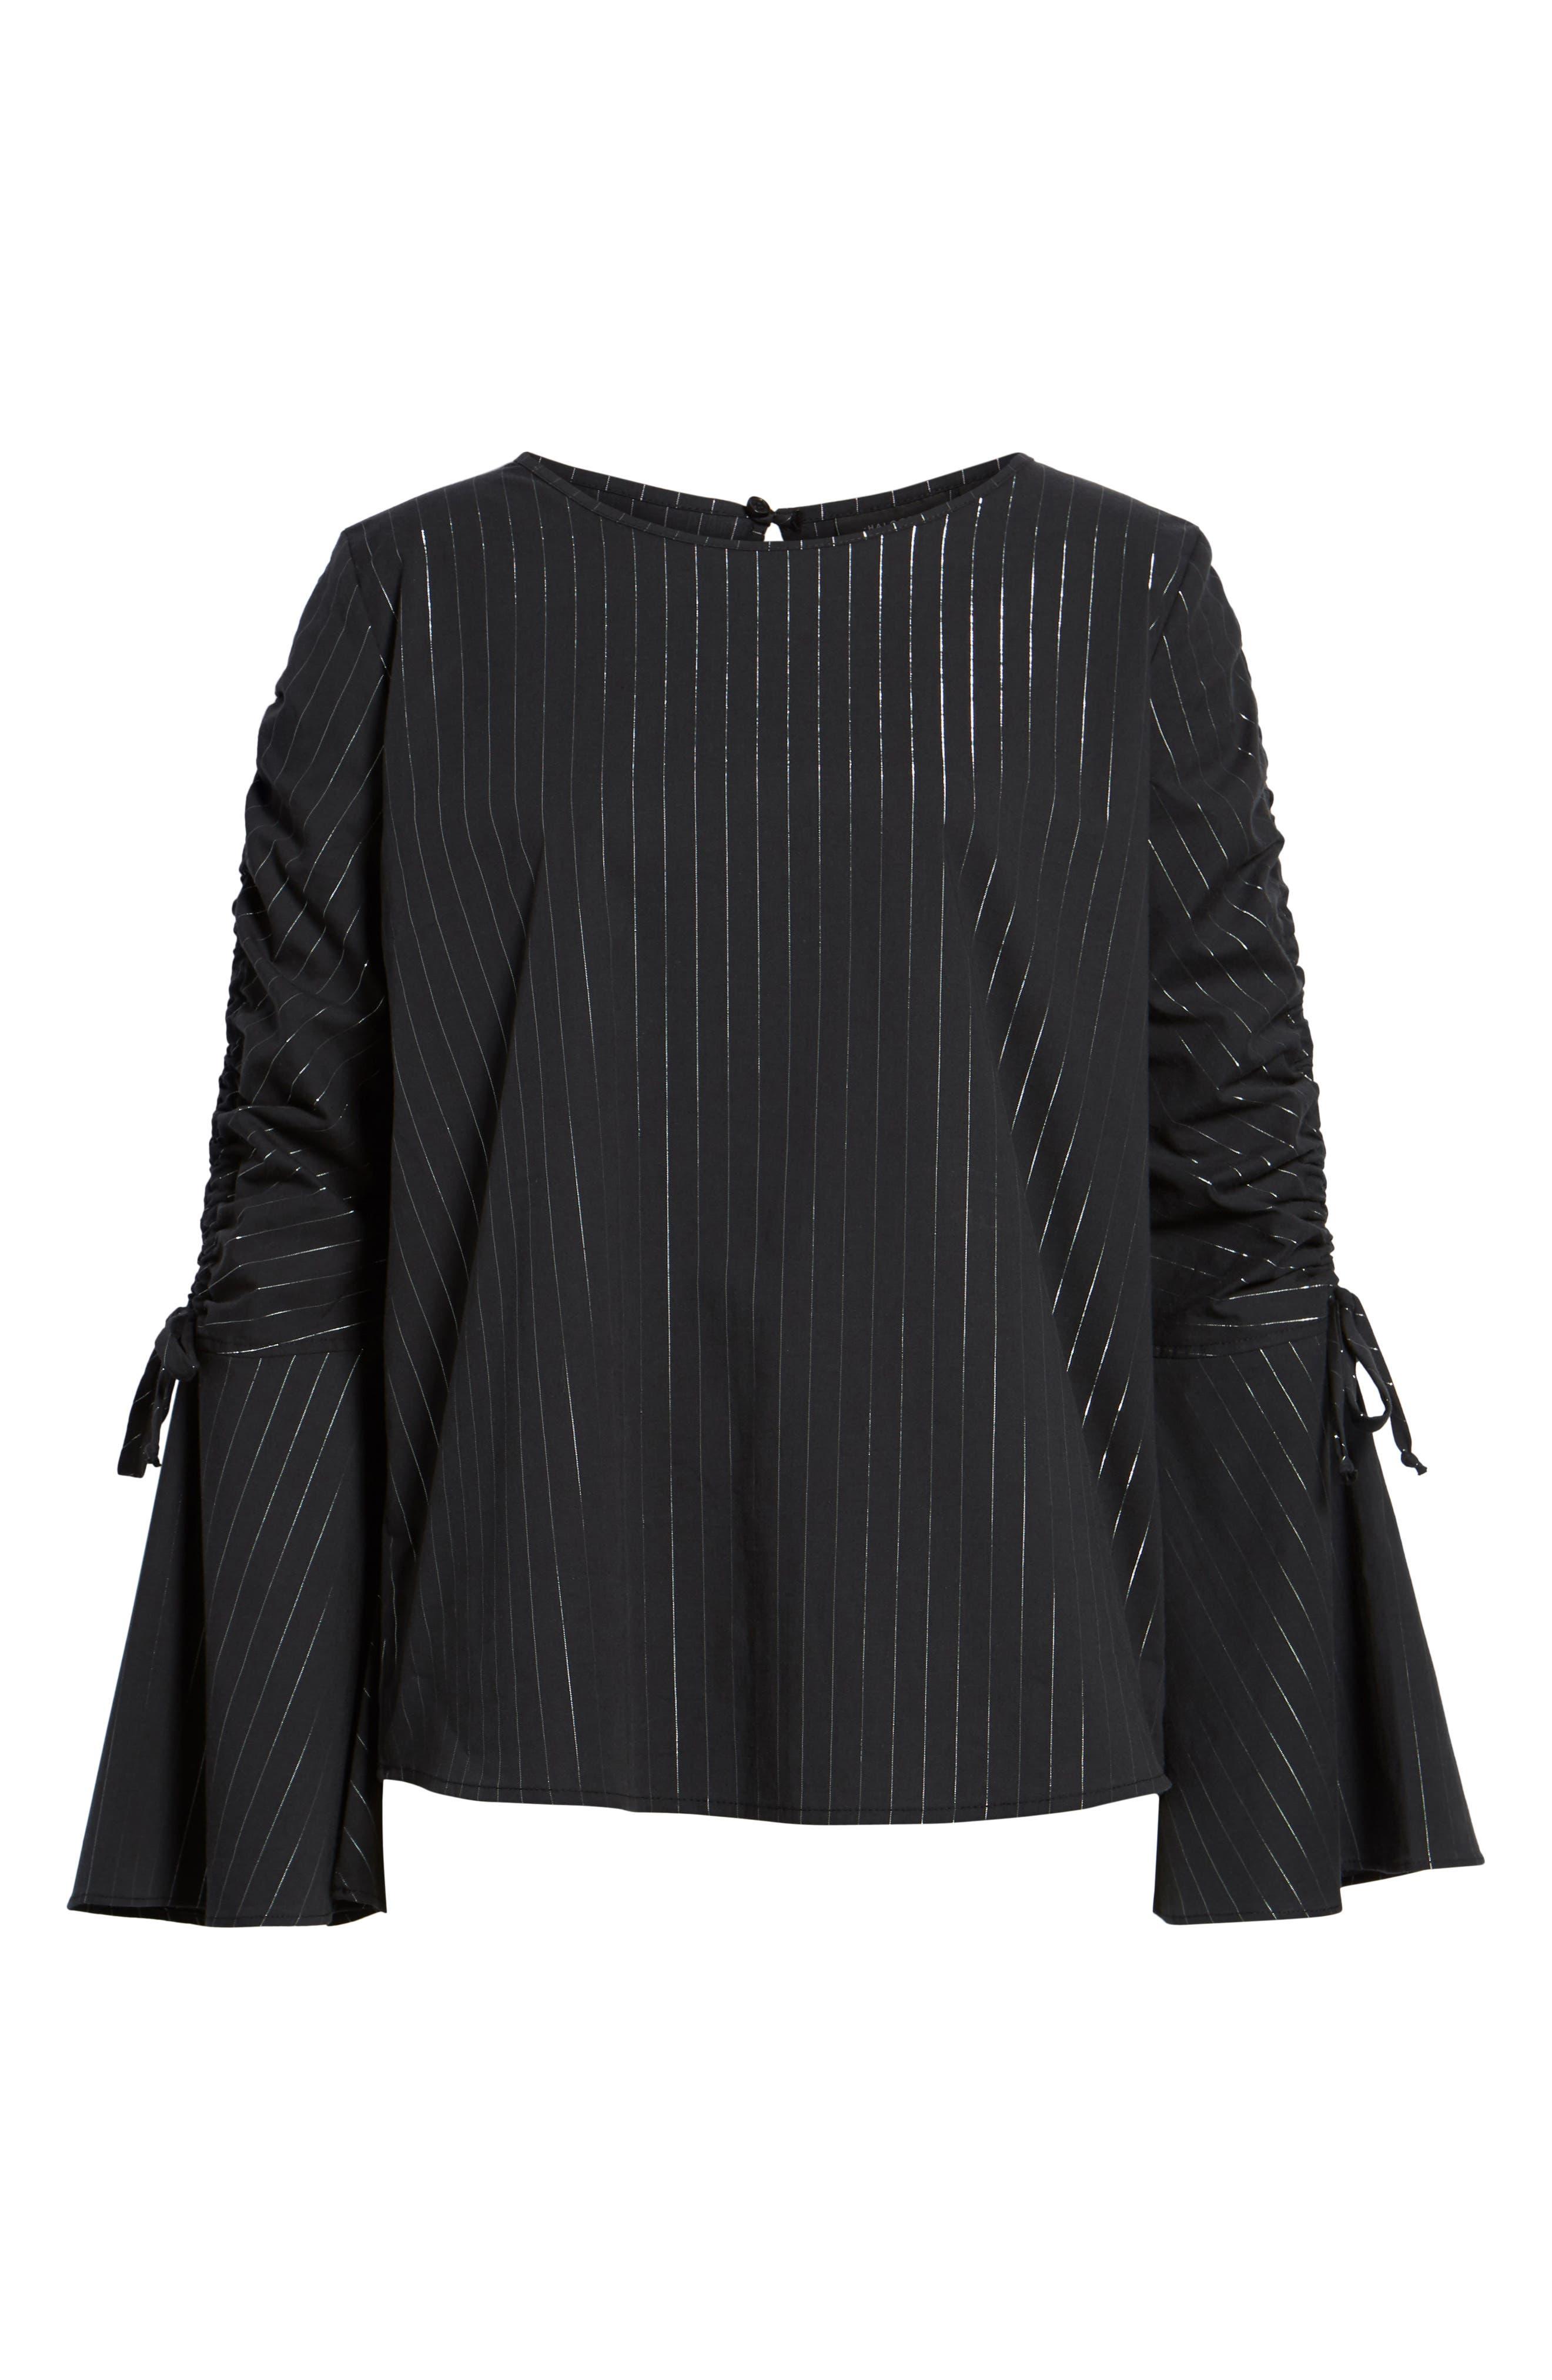 Ruched Sleeve Stripe Top,                             Alternate thumbnail 6, color,                             Black Wide Lurex Stripe